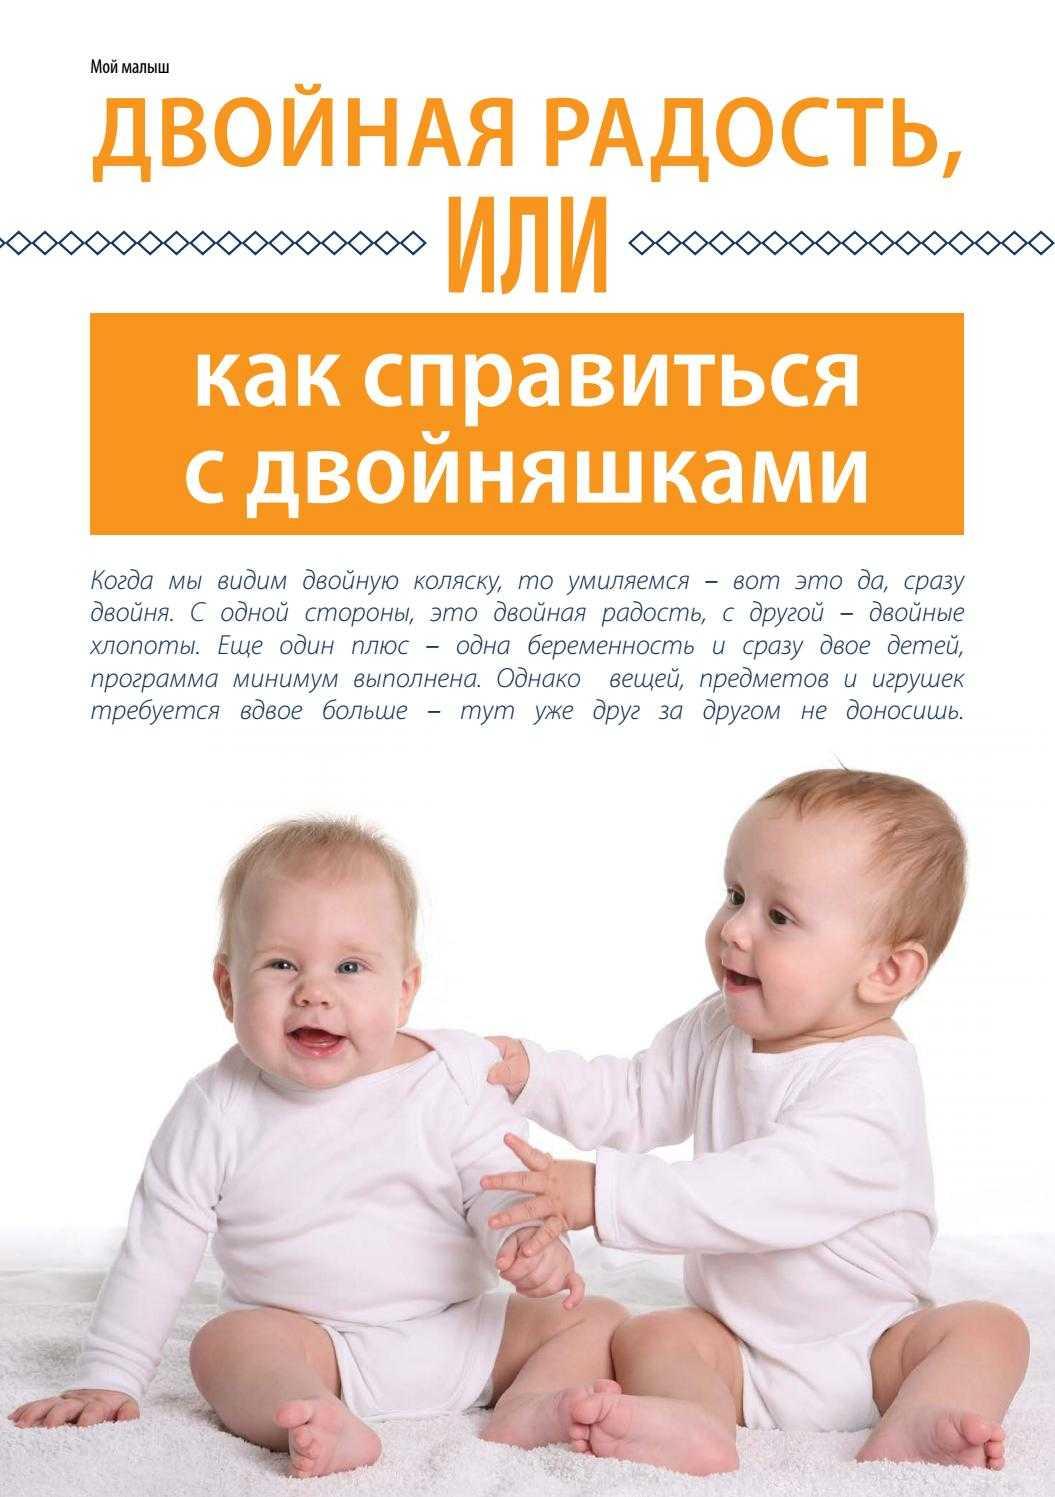 Уход за двойней - нужные советы маме двойняшек